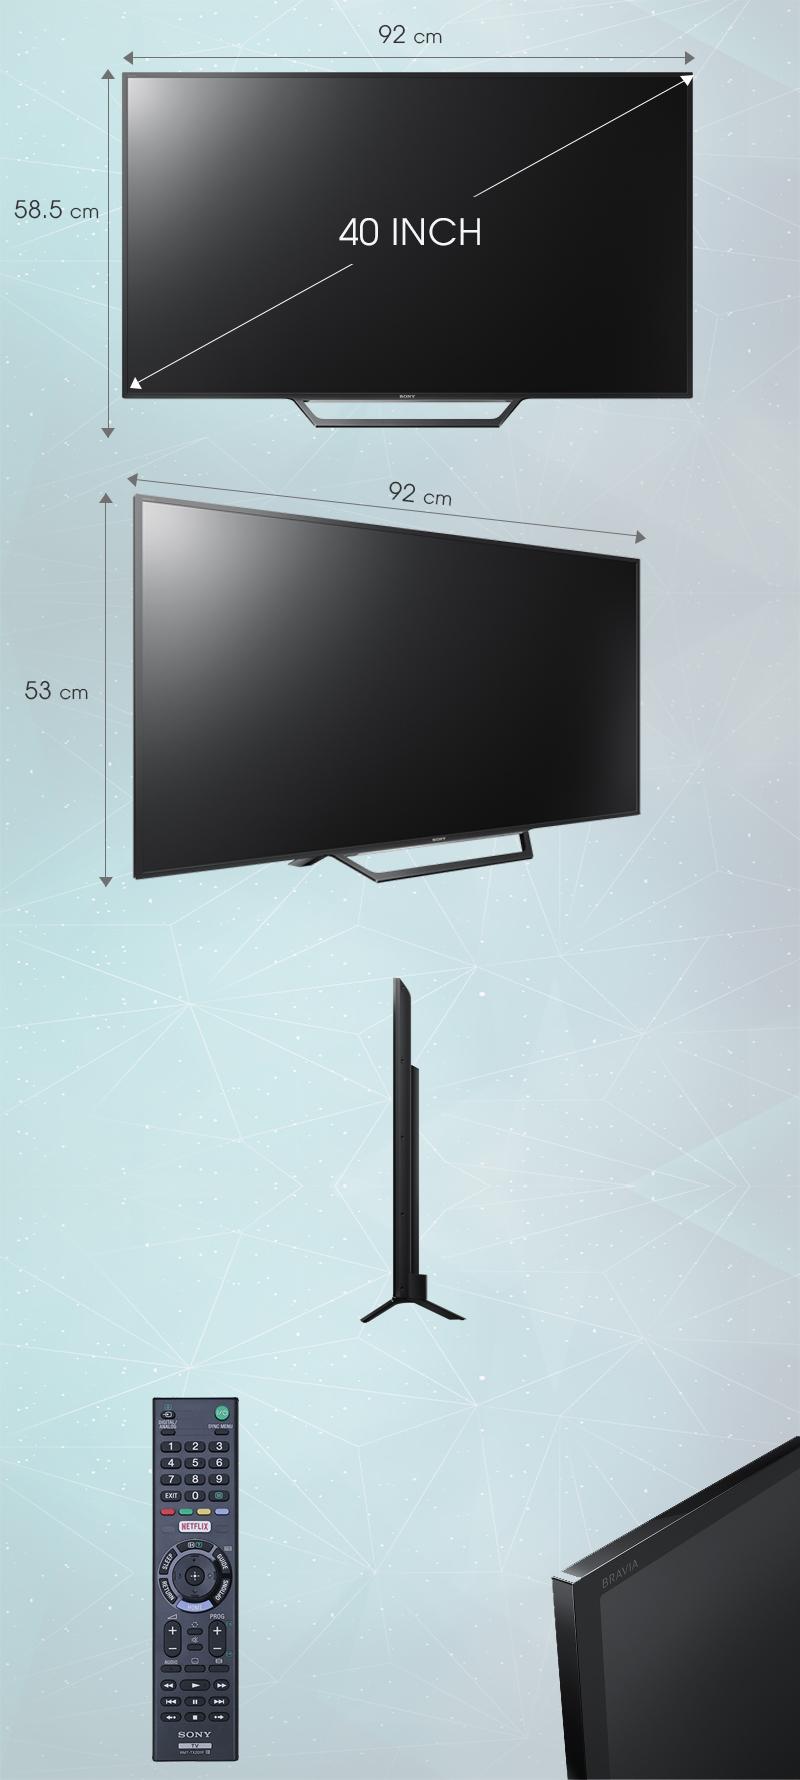 Internet Tivi Sony 40 inch KDL-40W650D - Kích thước tivi